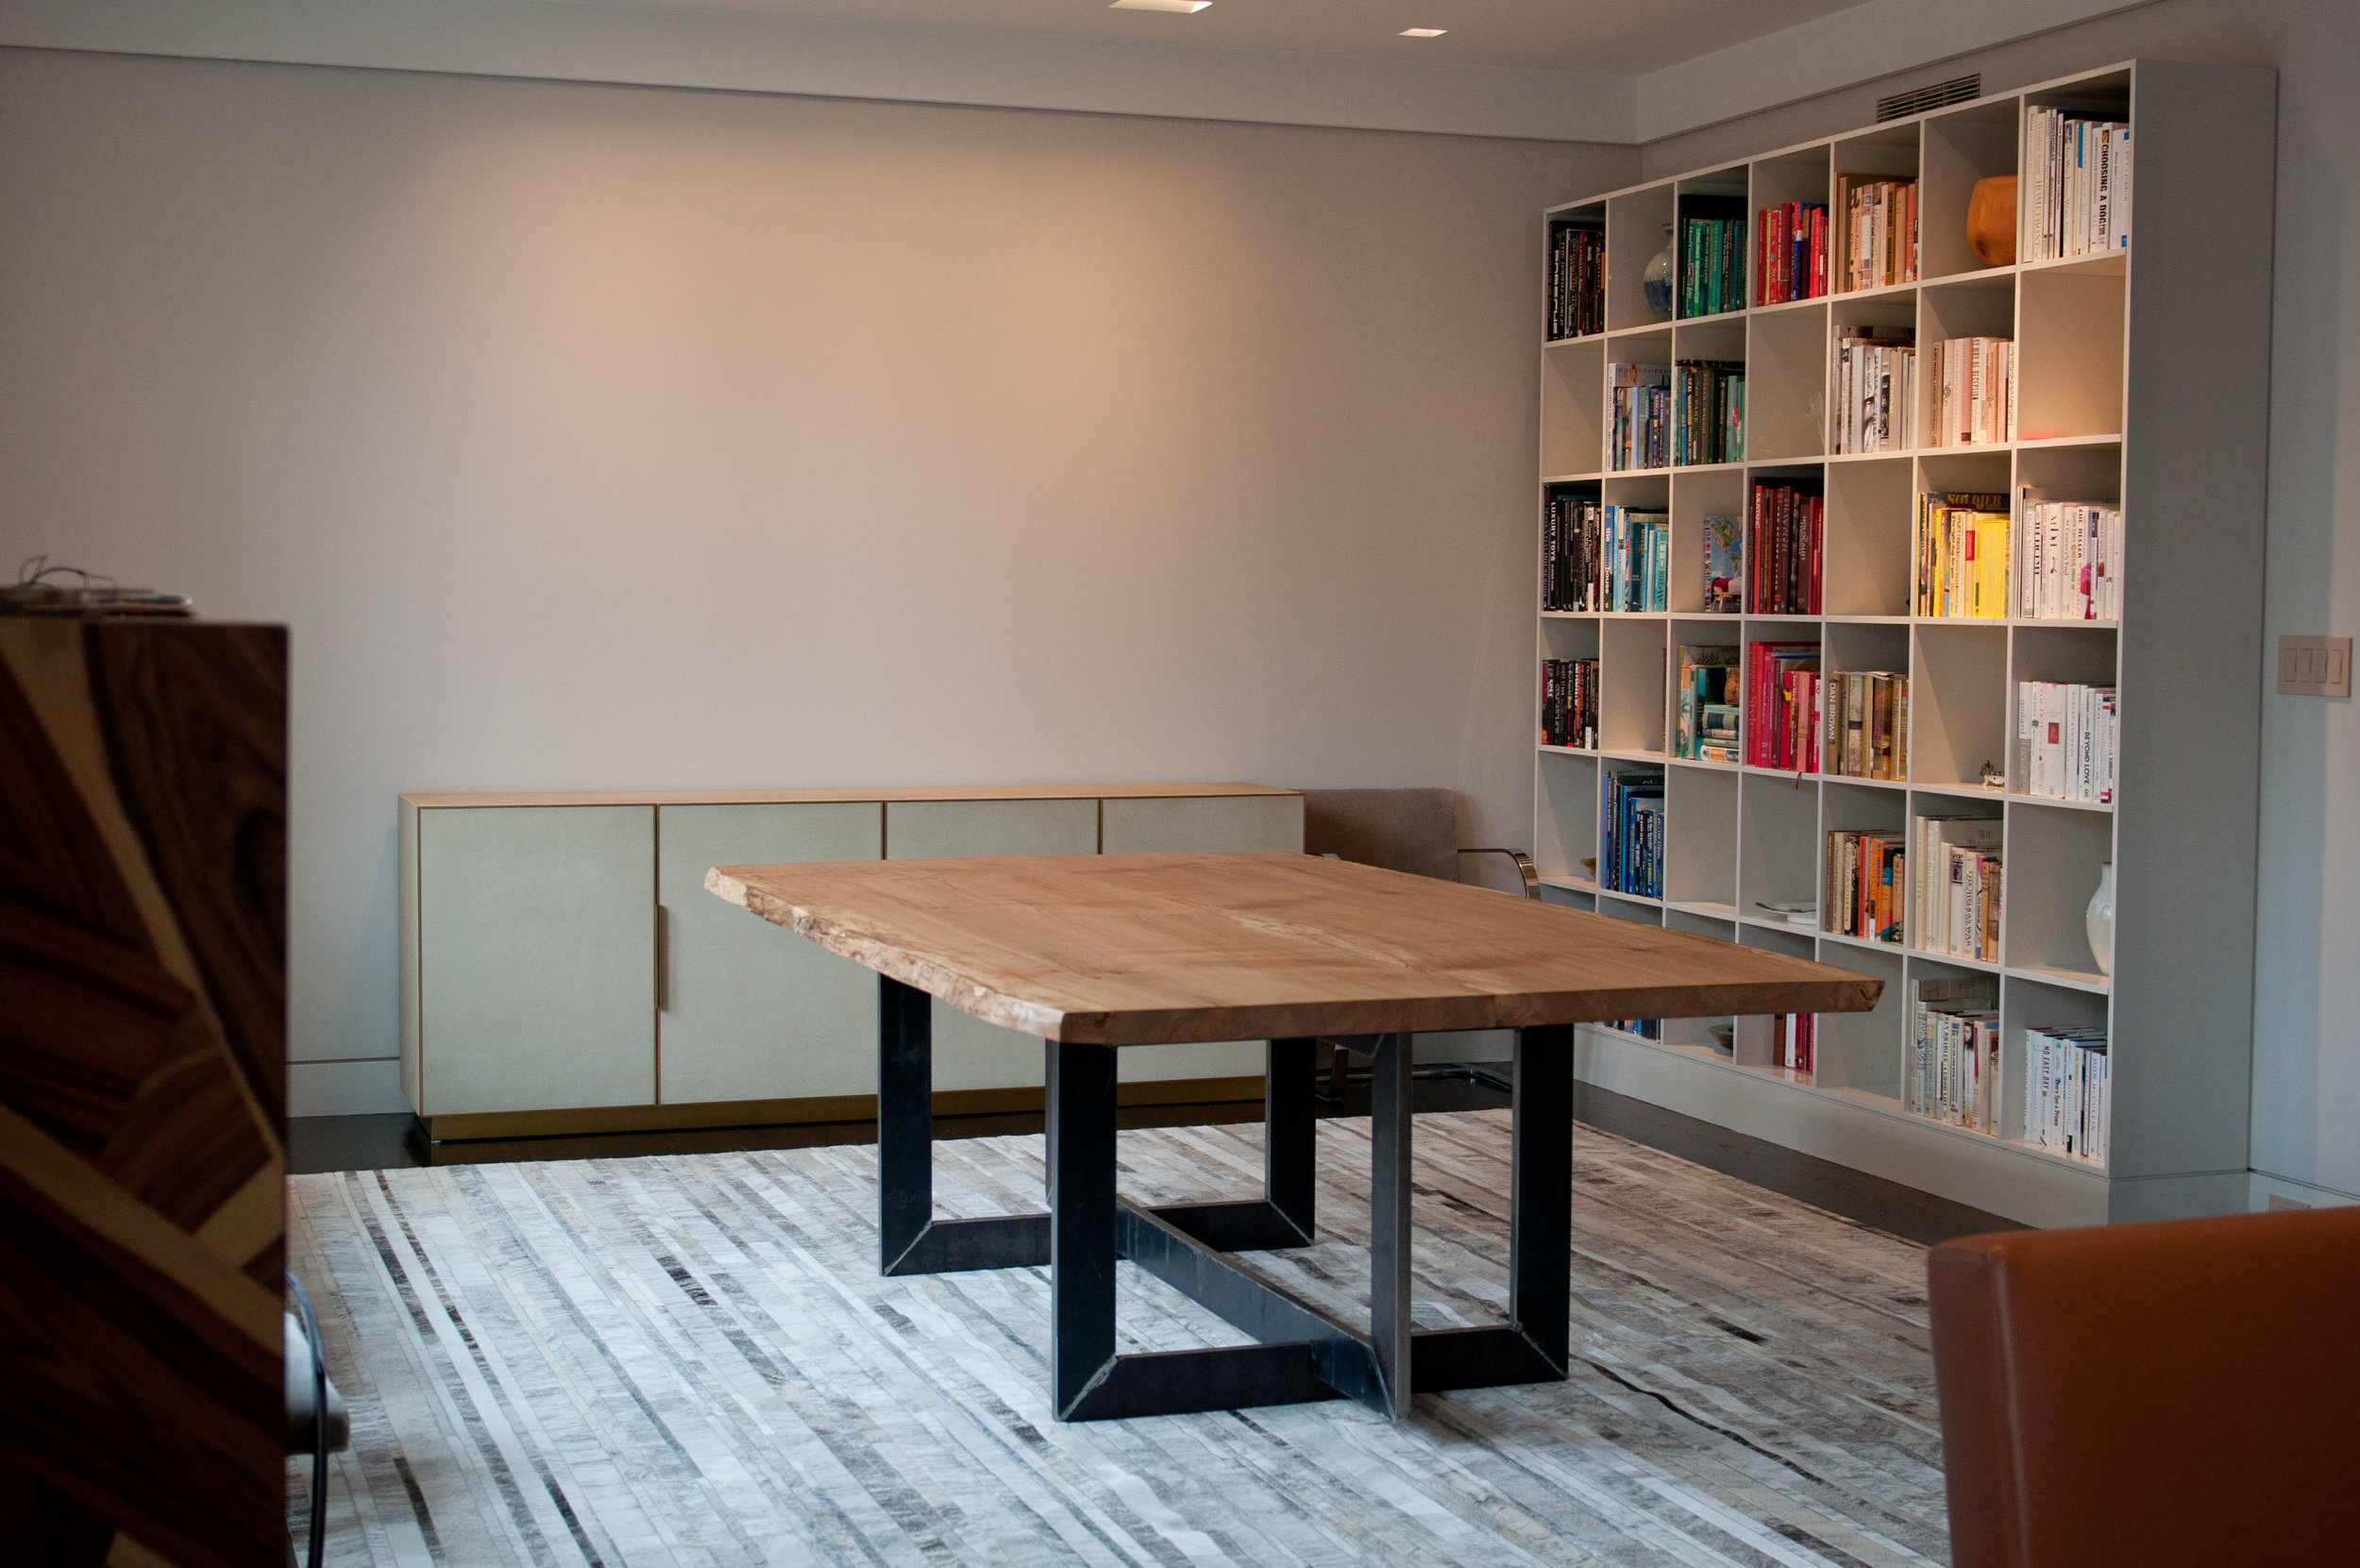 Bespoke furniture, custom handmade industrial style, dining room table